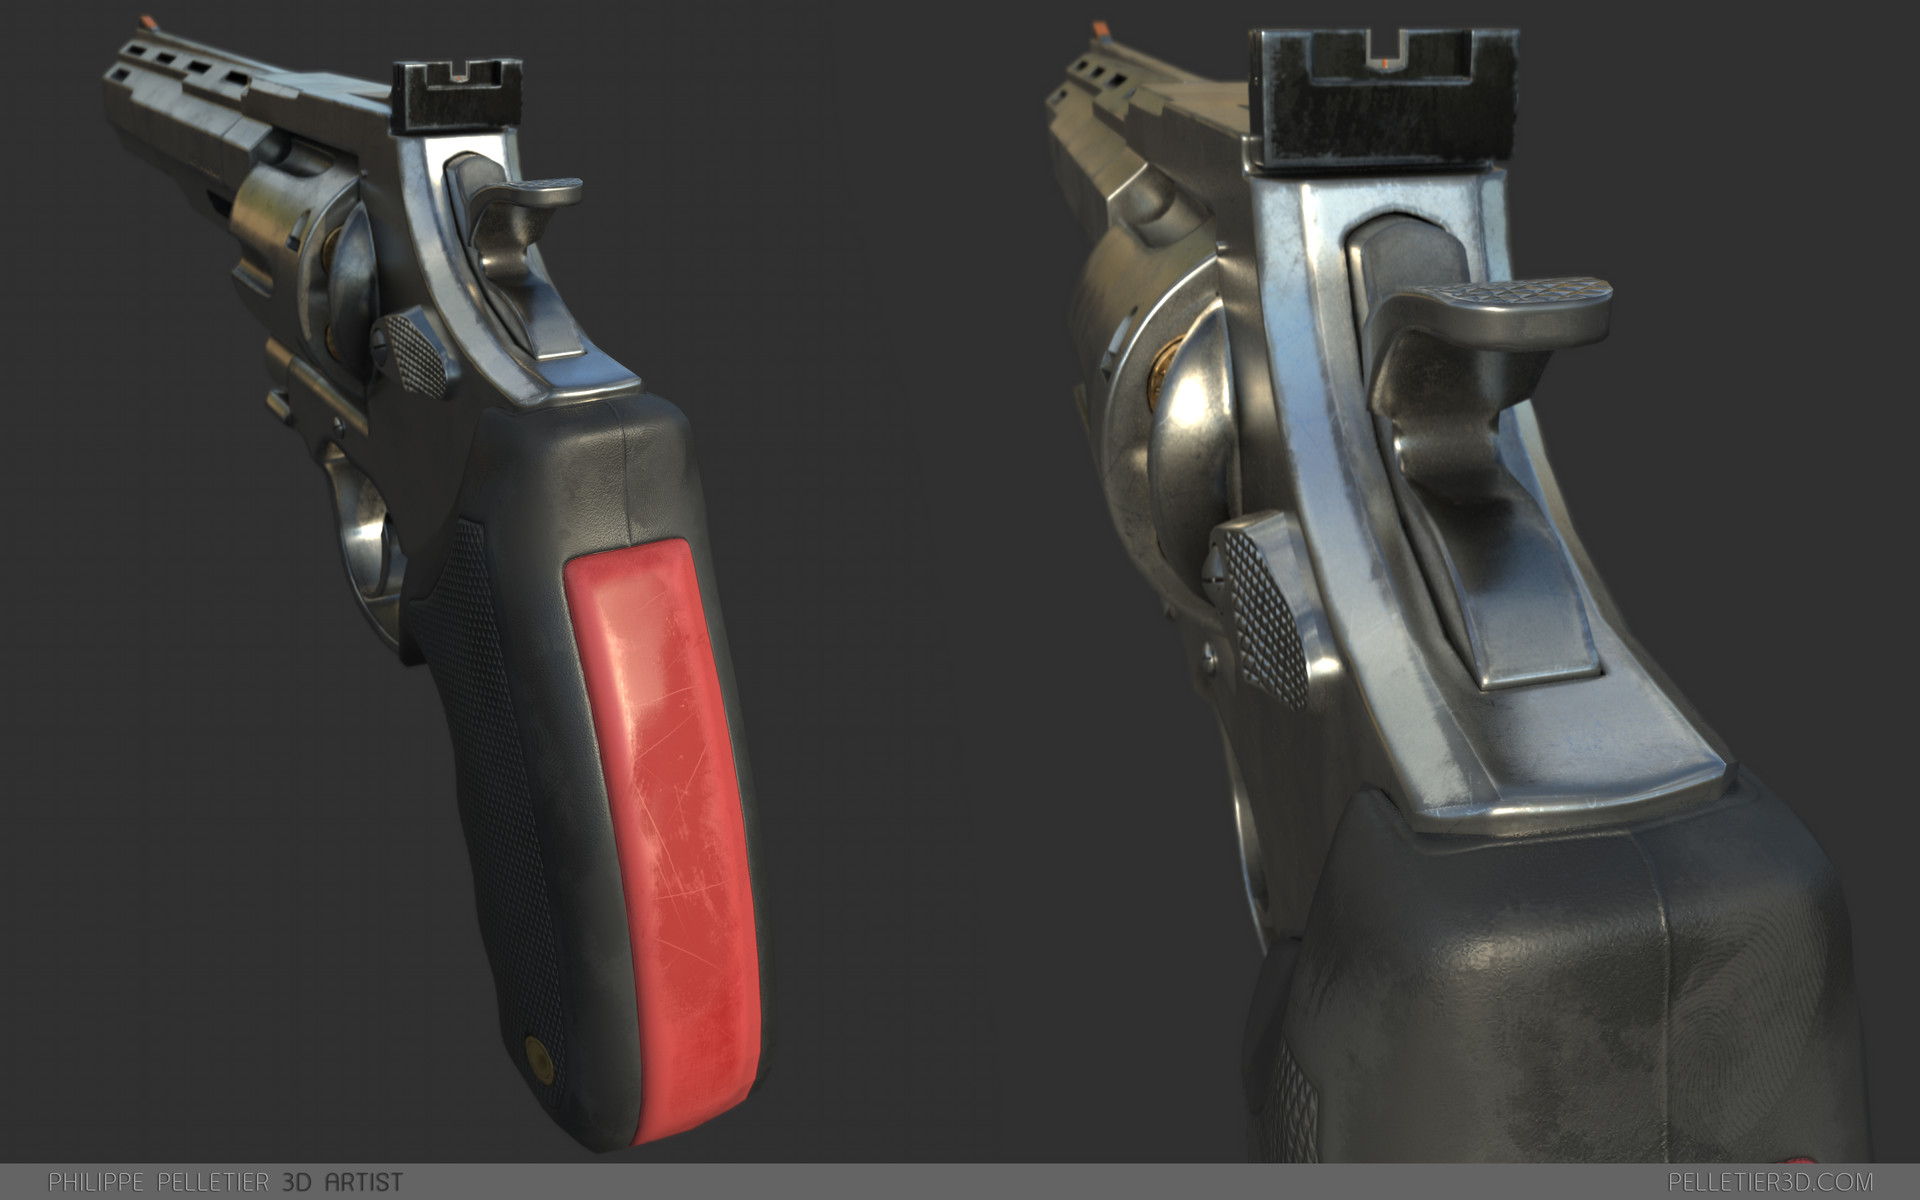 Philippe pelletier revolver 004